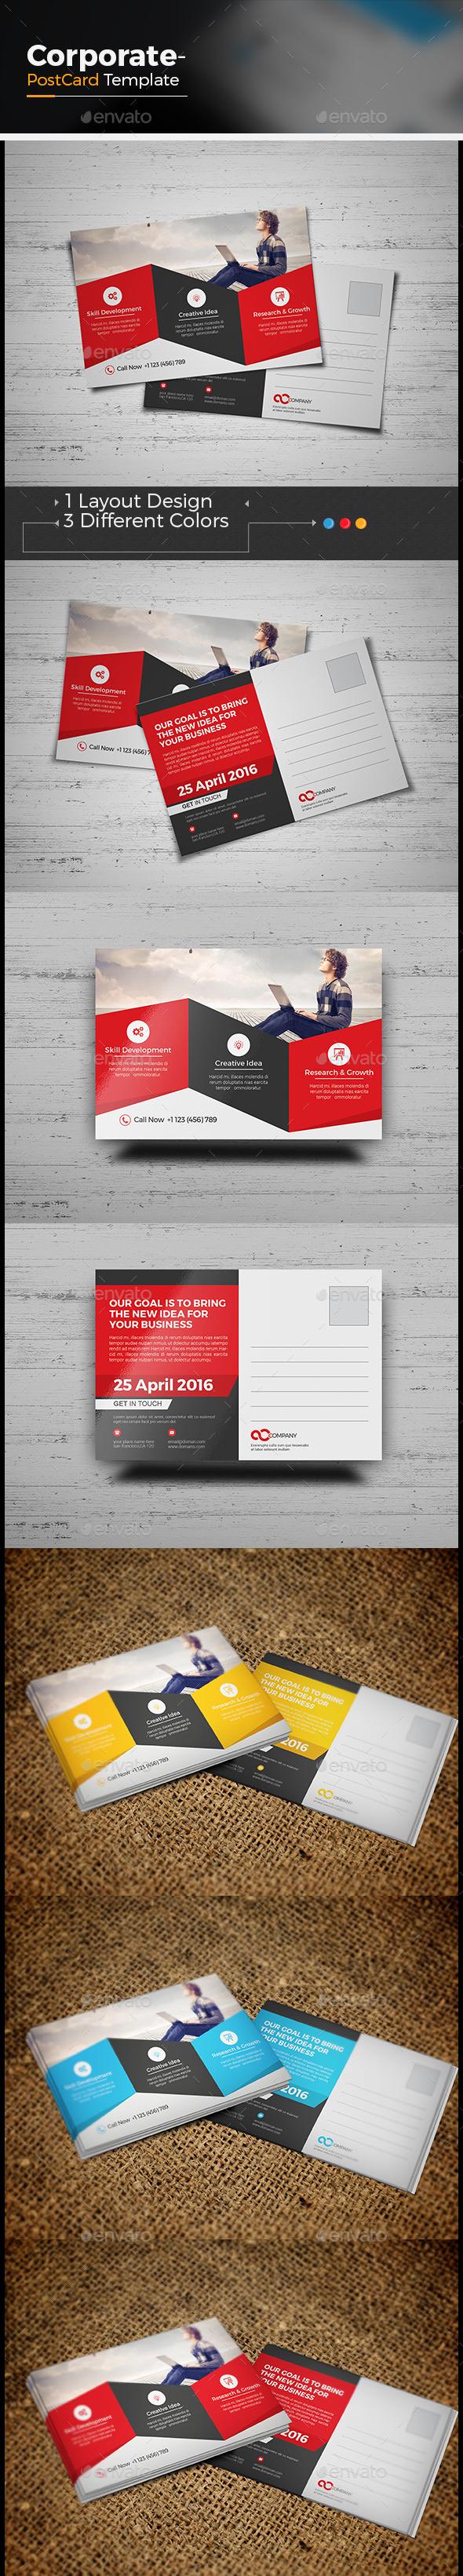 Corporate Postcard - Cards & Invites Print Templates